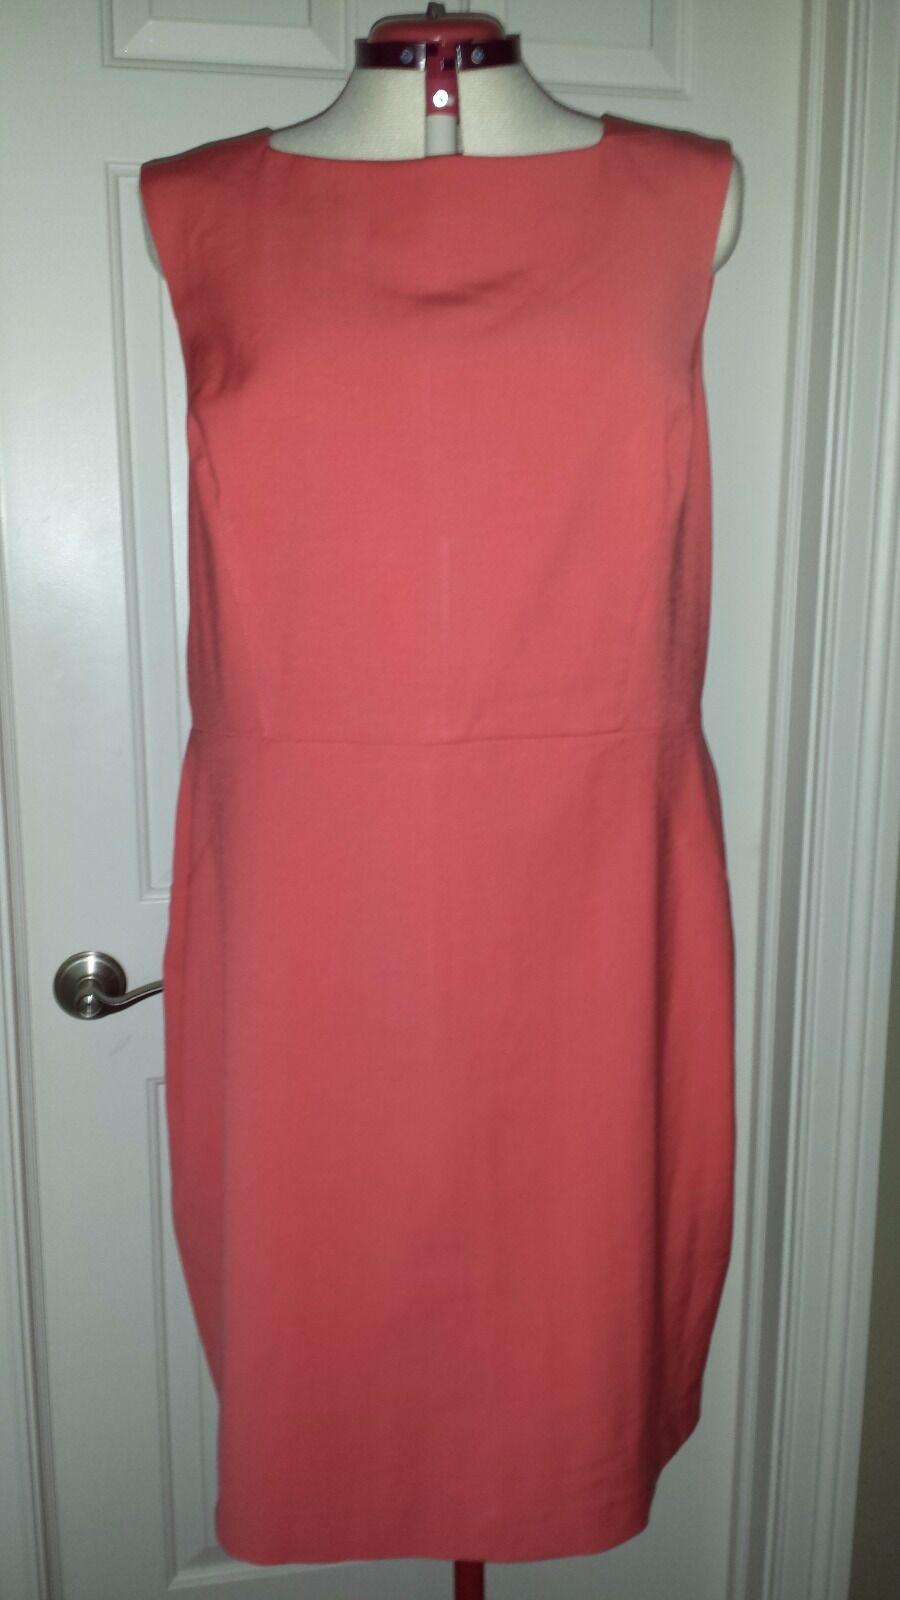 NWT Talbots Sleeveless Sheath Dress Size 20 W